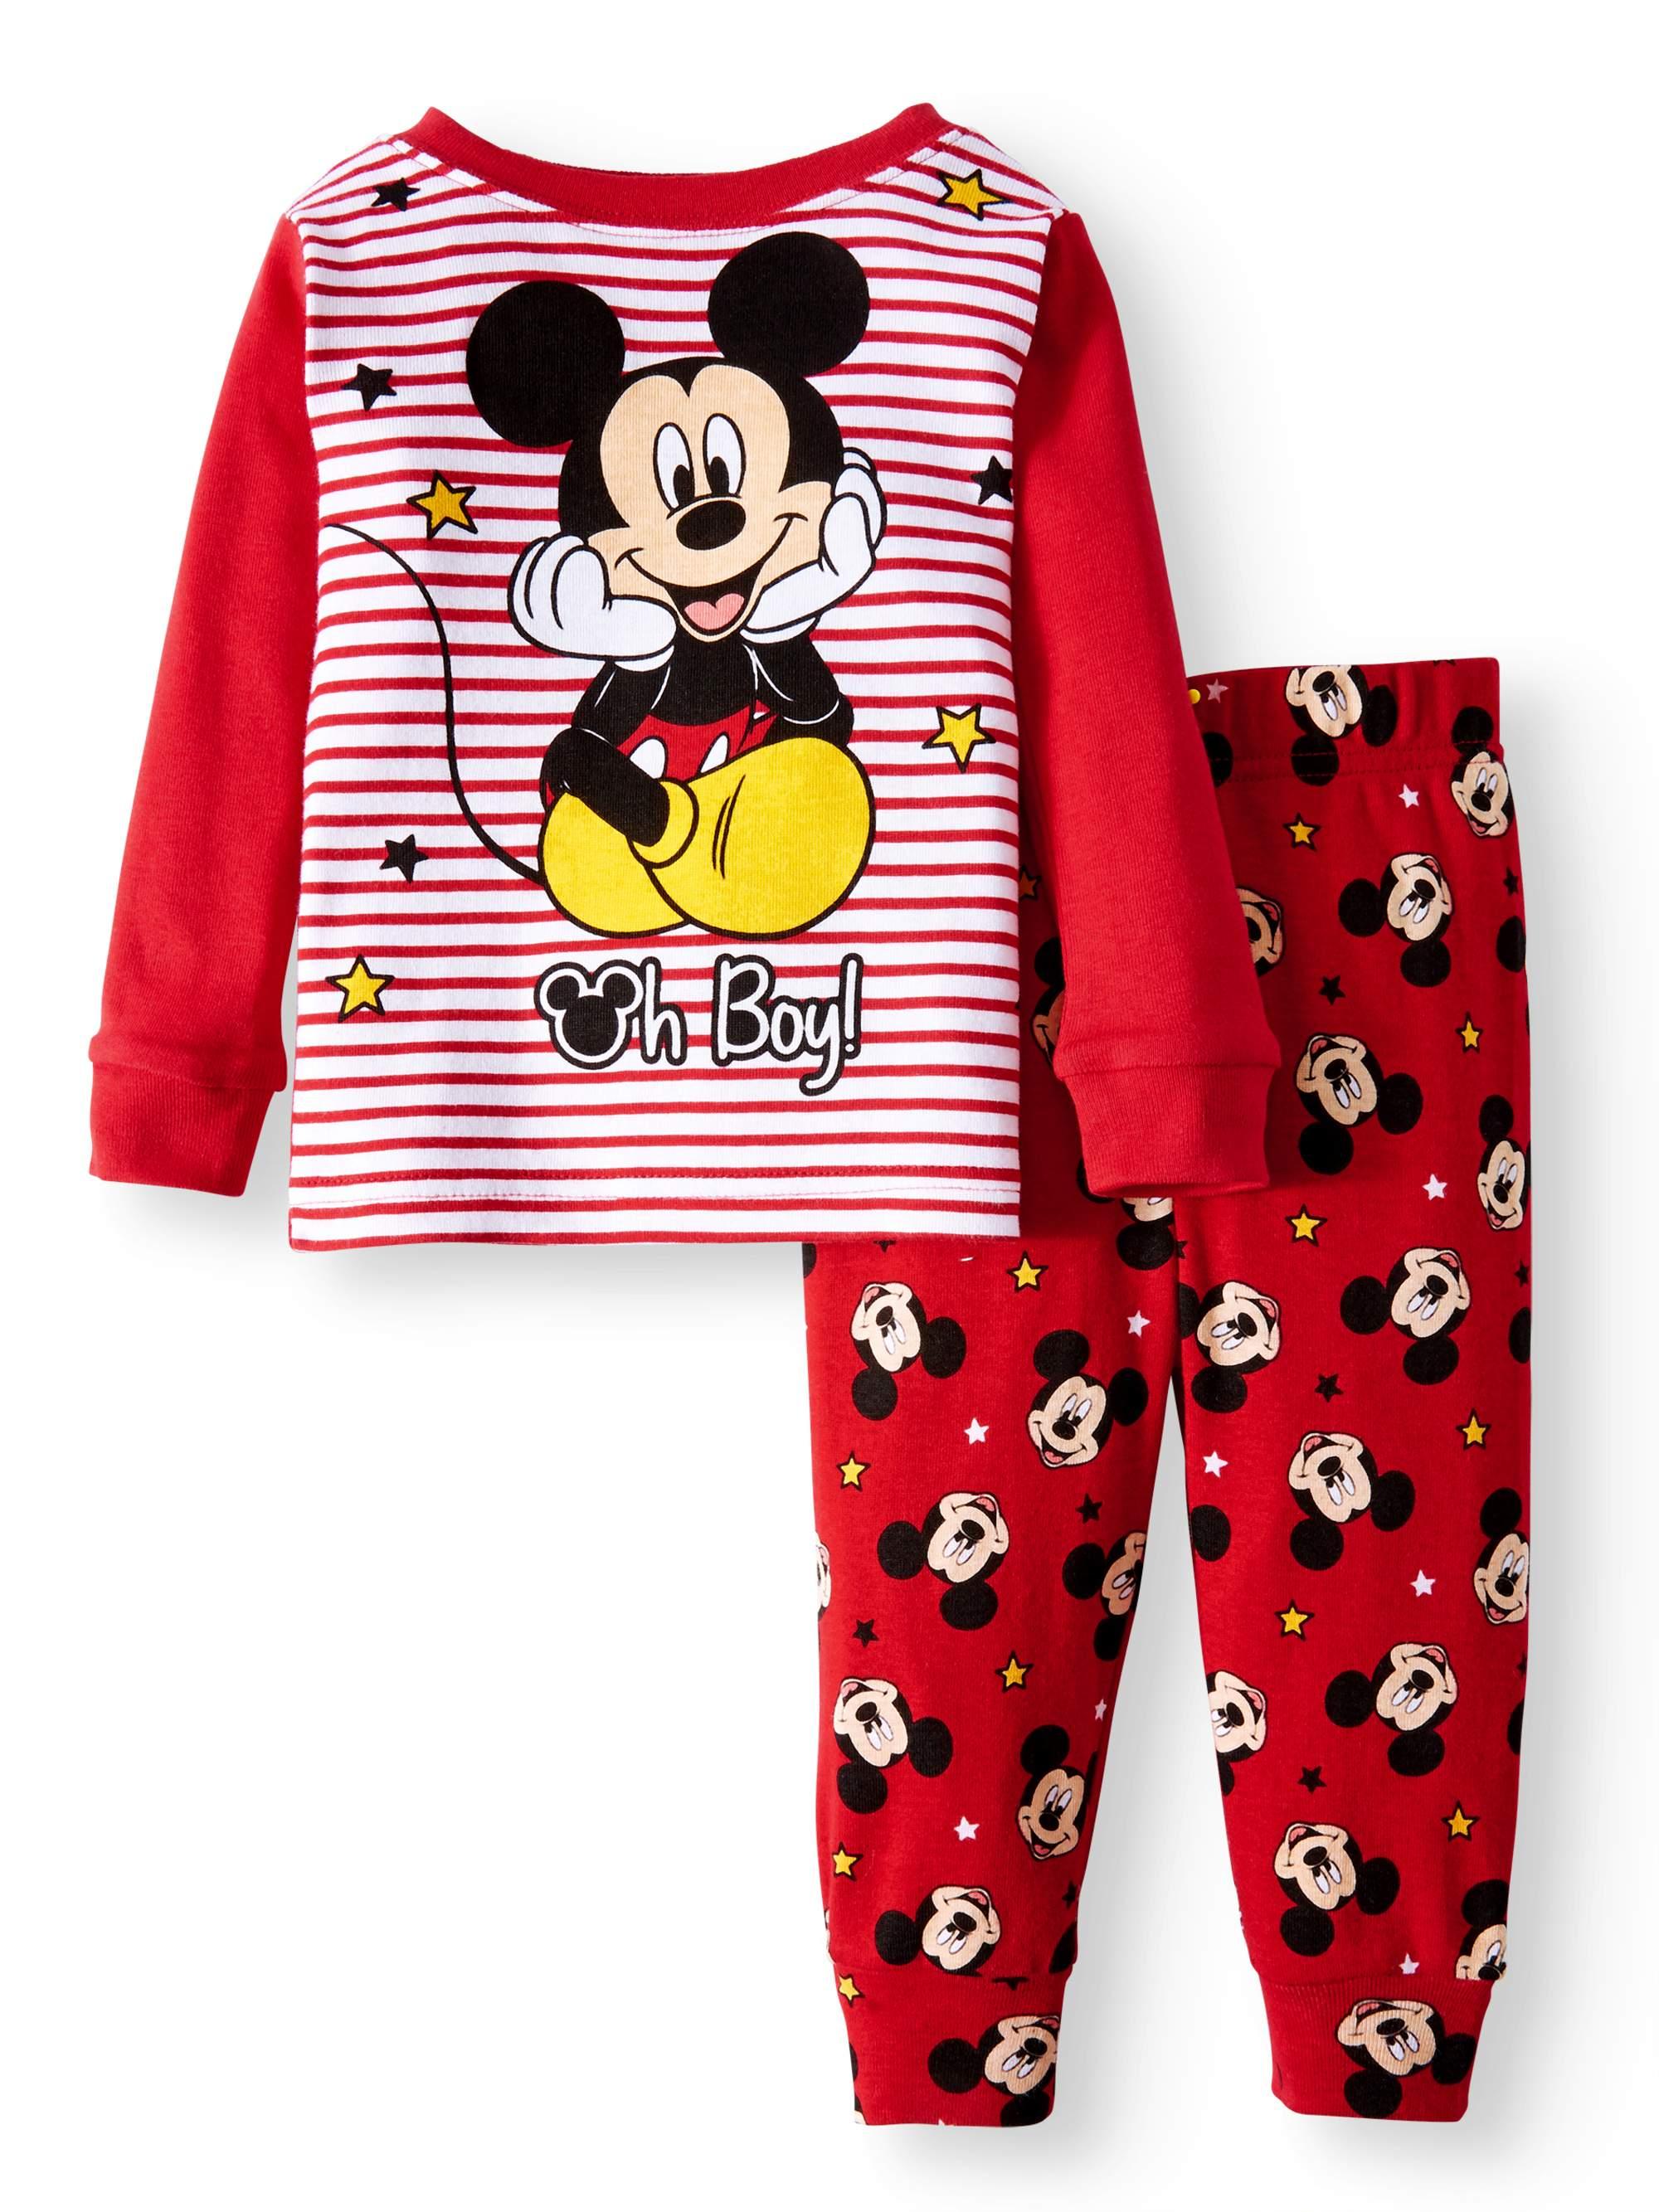 Mickey Mouse Cotton Tight Fit Pajamas, 2-piece Set (Baby Boys)